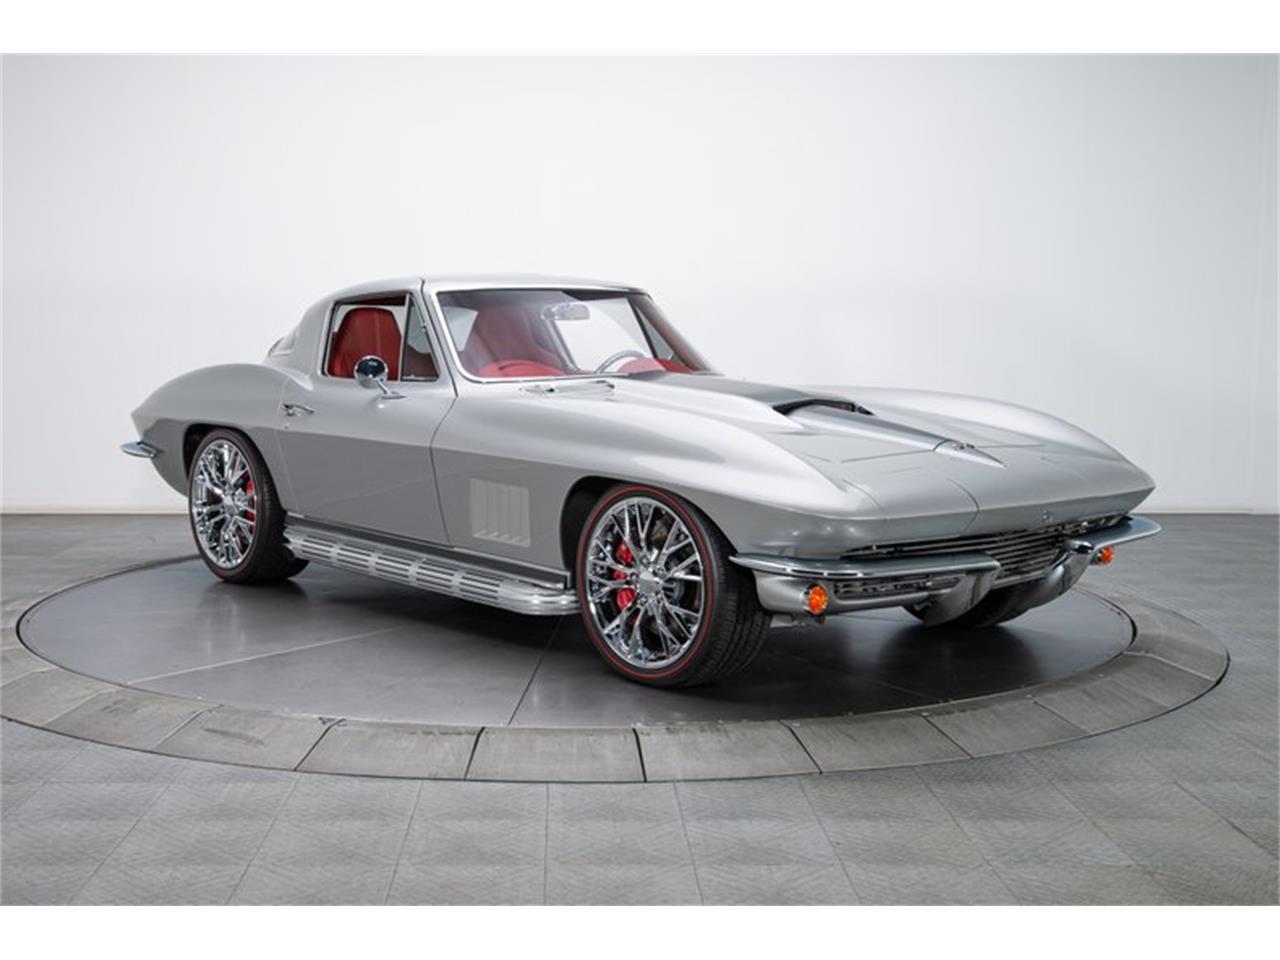 Large Picture of Classic '67 Chevrolet Corvette located in Charlotte North Carolina - $189,900.00 - Q4OM